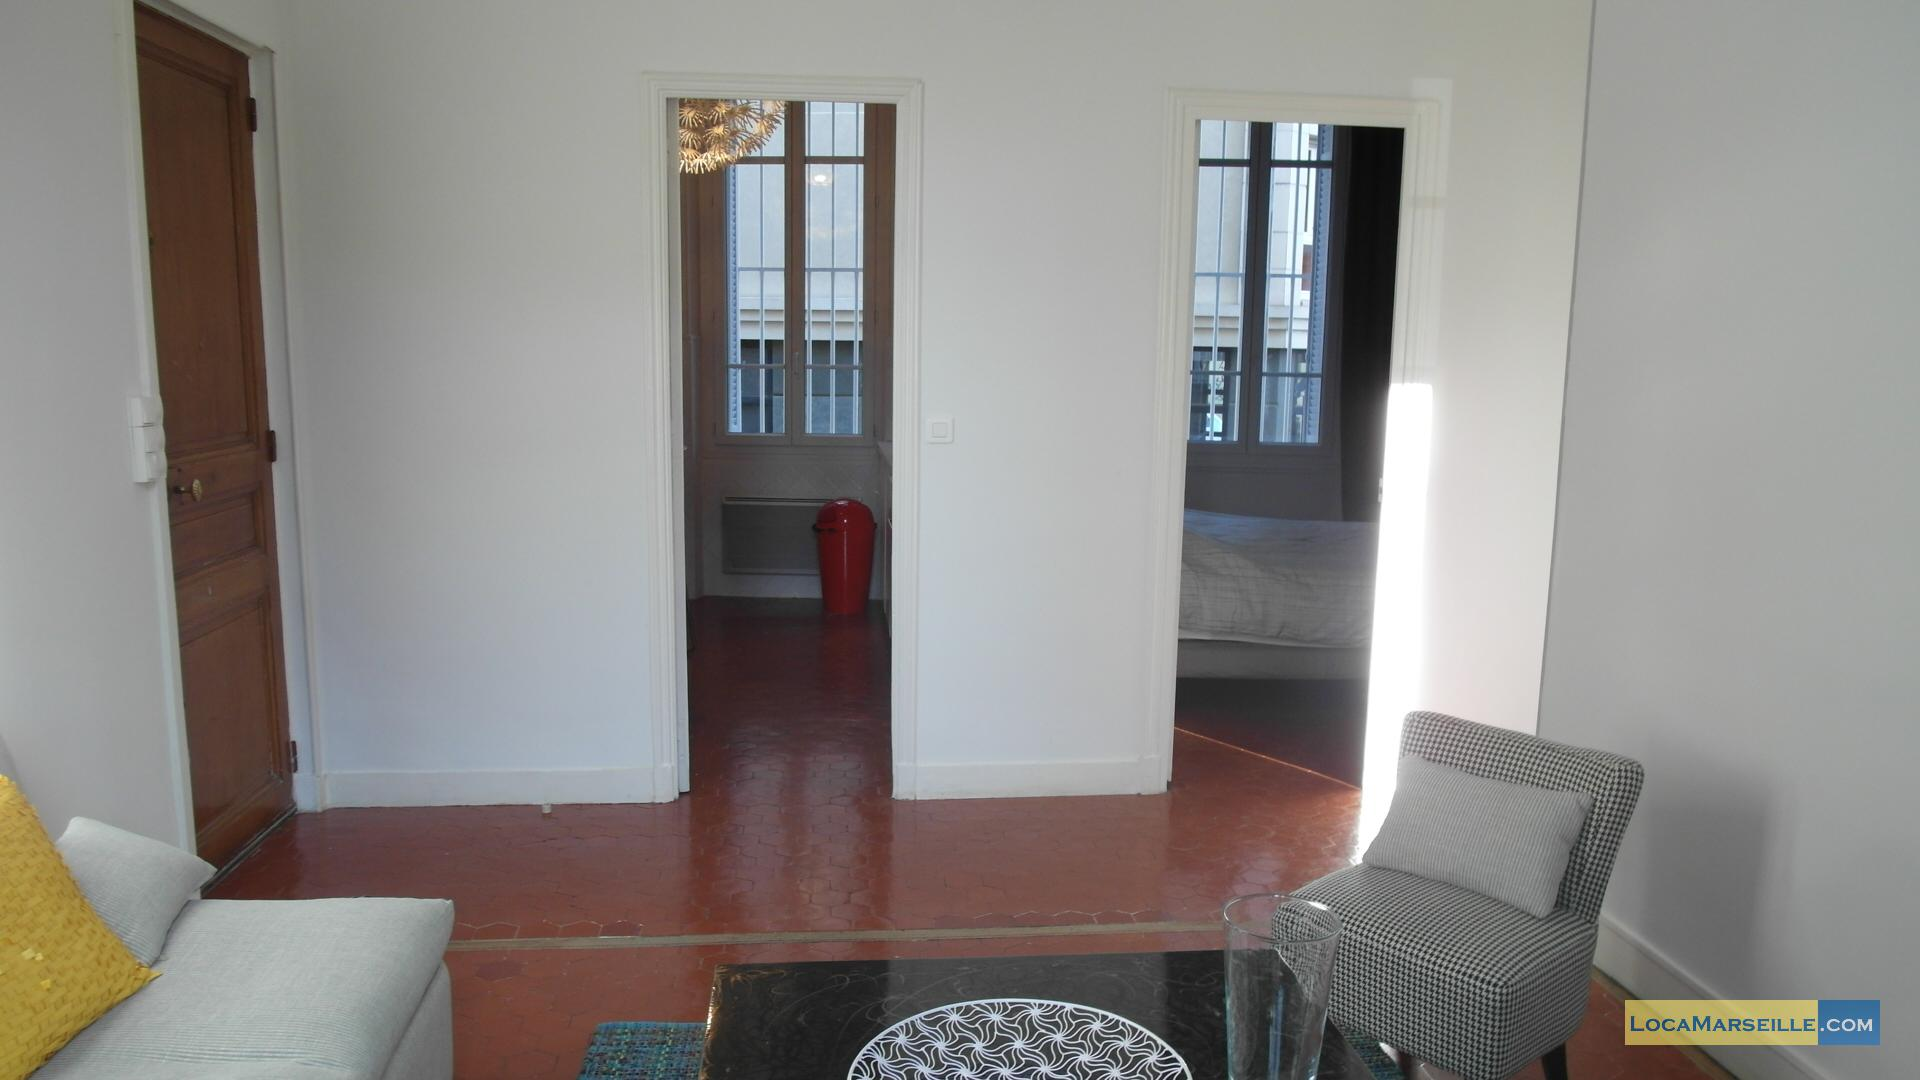 Location meubl e marseille proche du prado et de castellane for Location appartement design marseille